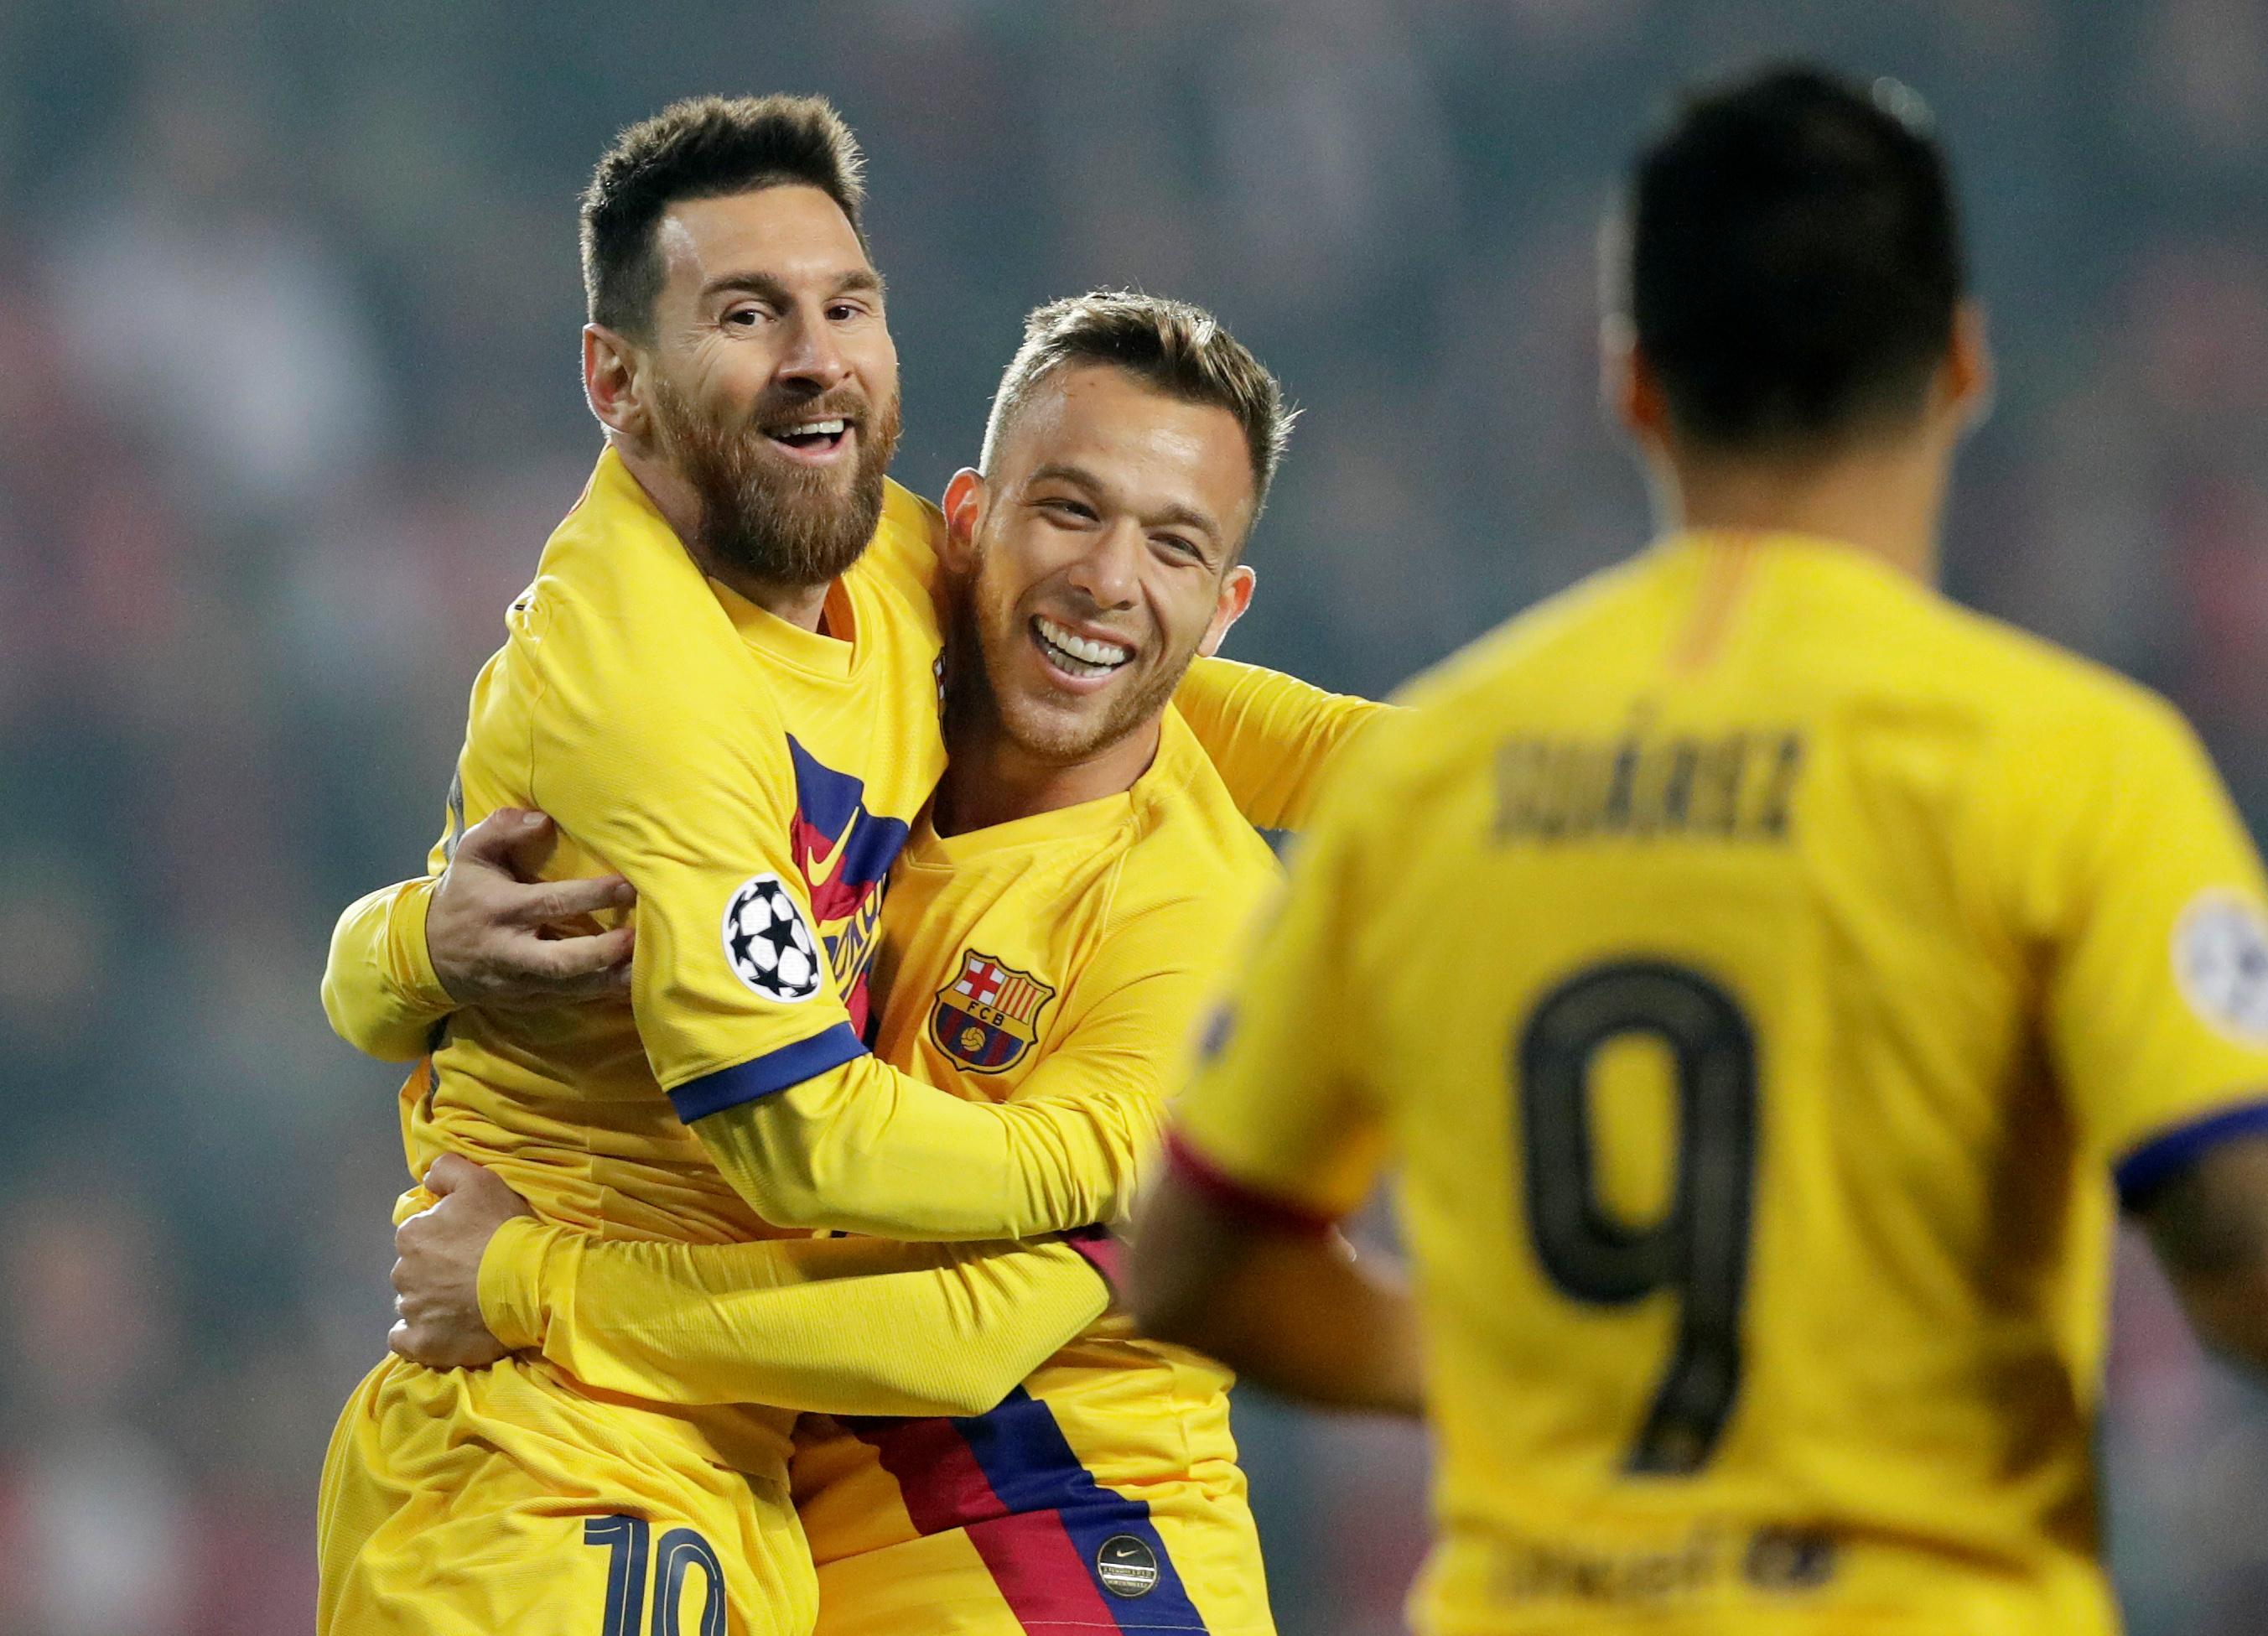 Barcelona midfielder Arthur Melo to miss El Clasico